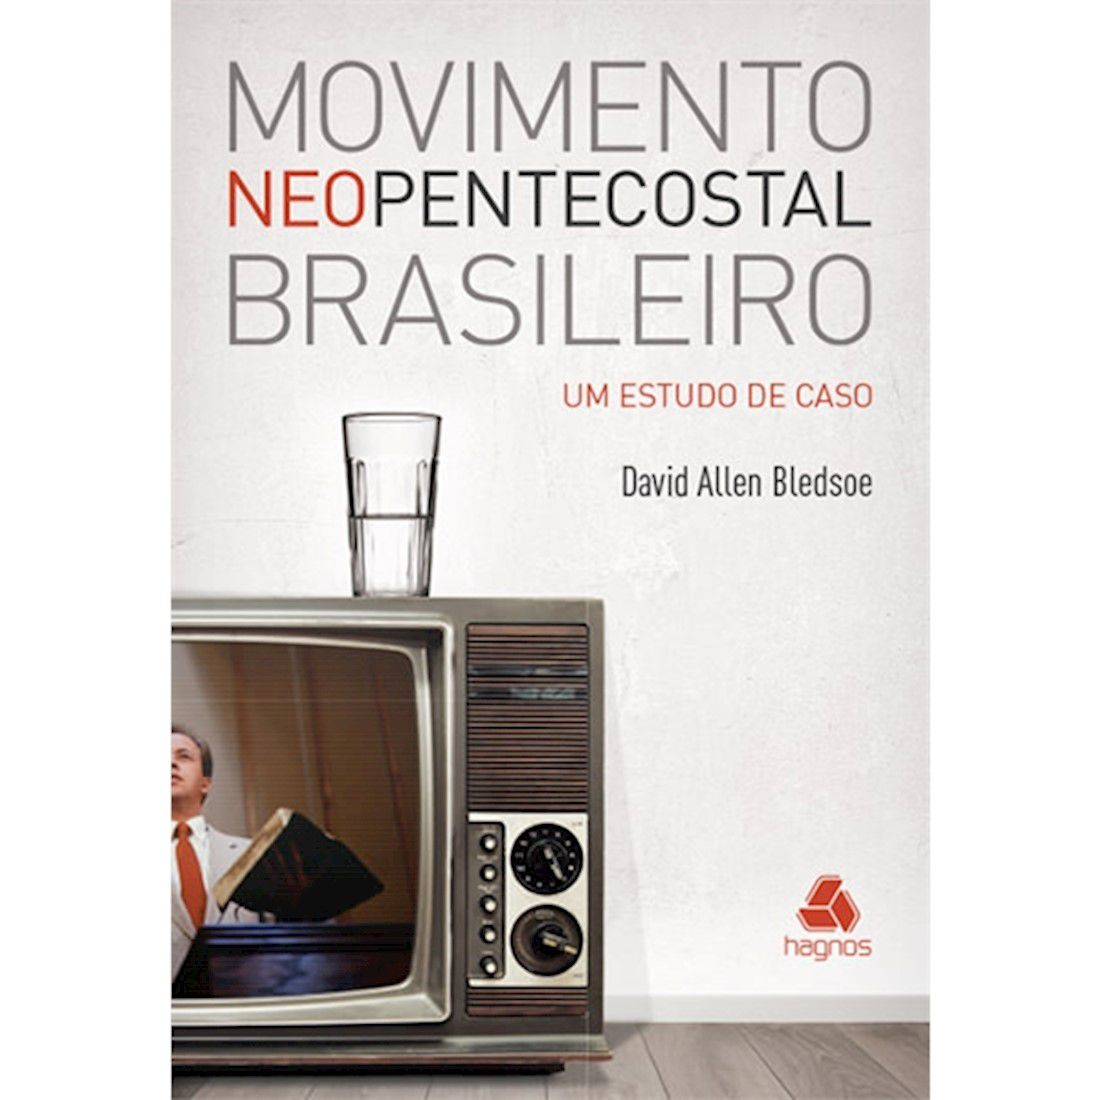 Livro Movimento Neopentecostal Brasileiro